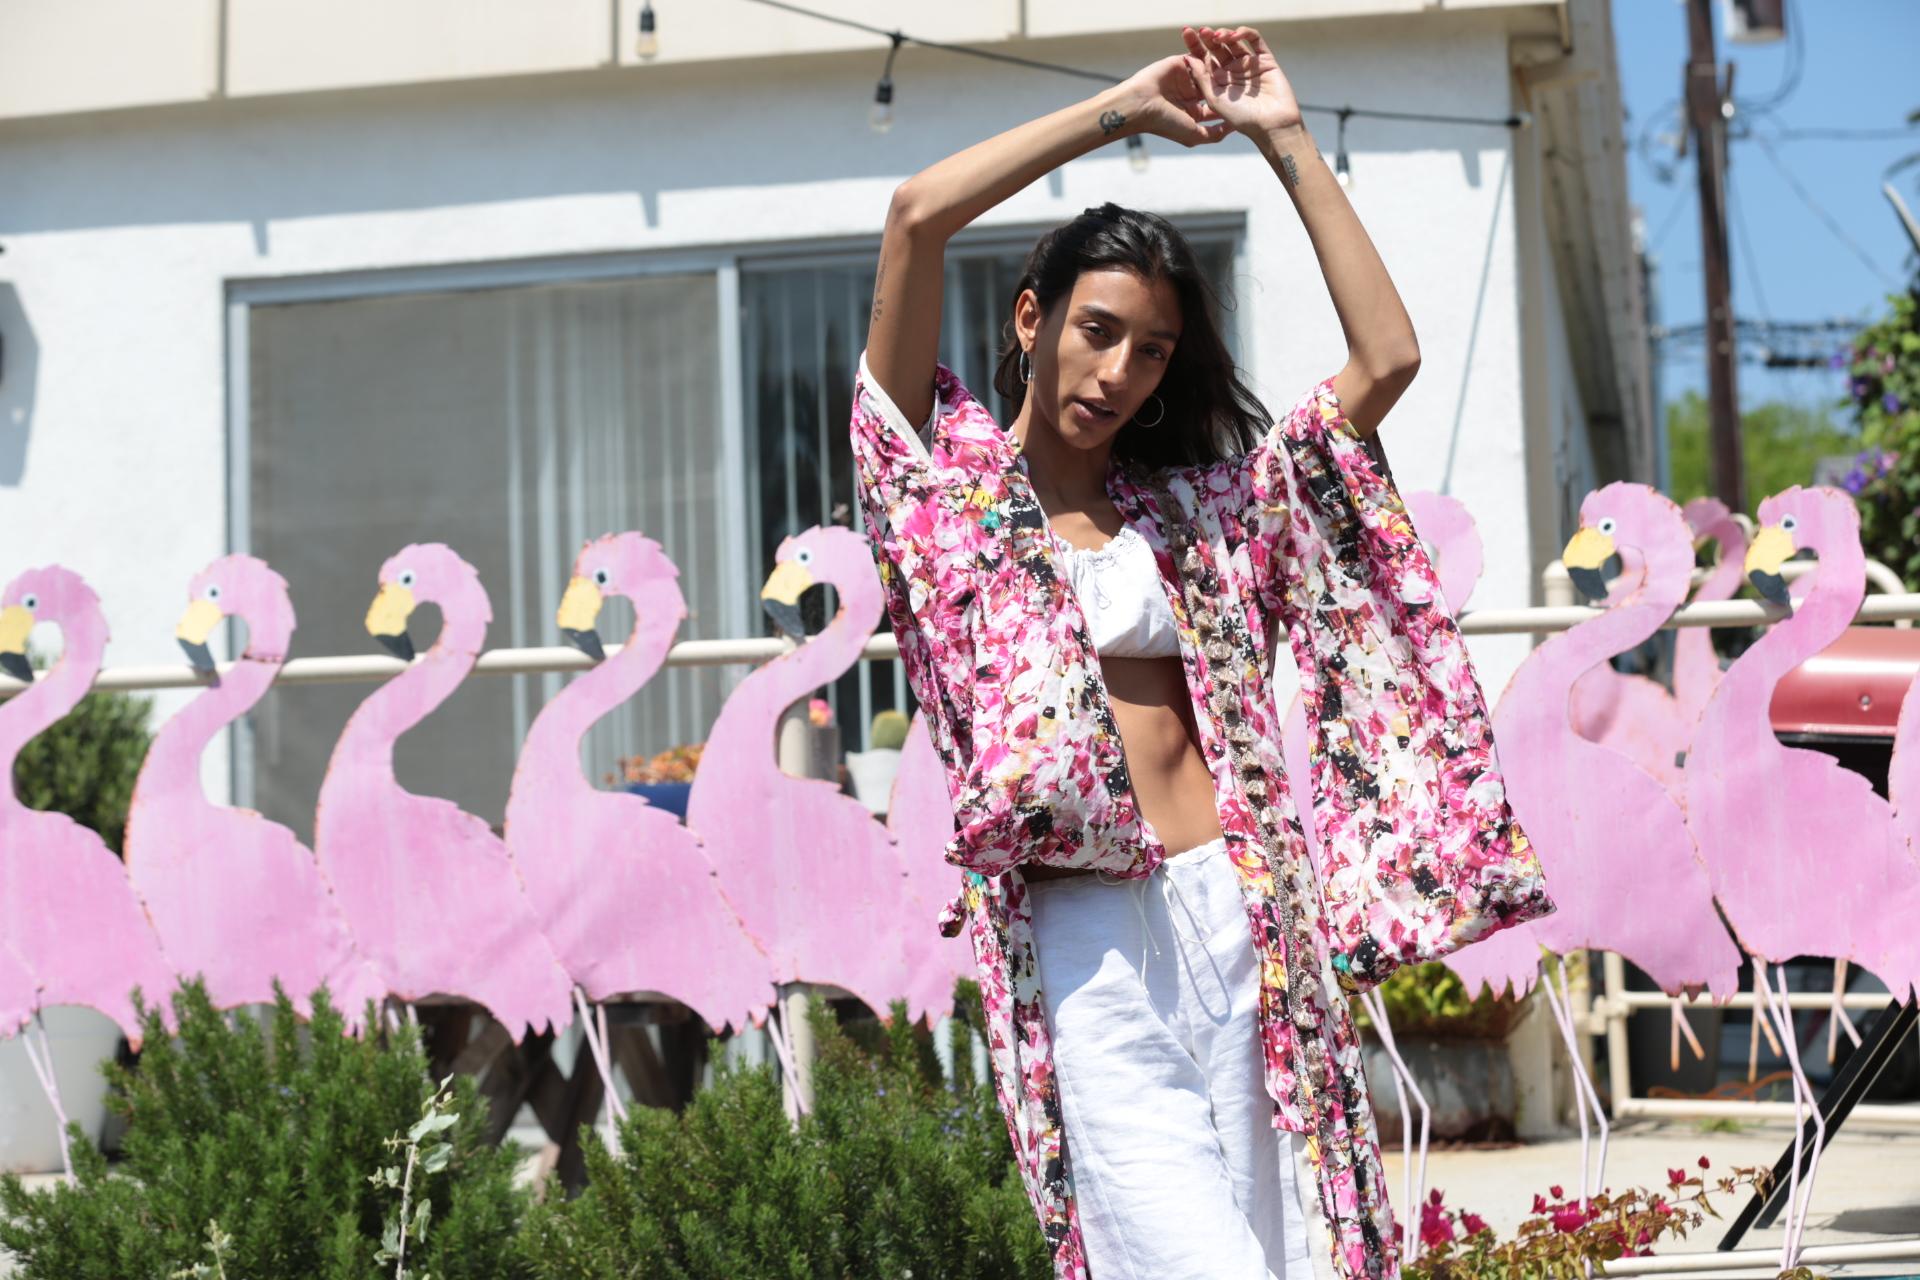 VENICE LALA | Photography by Jihanne Tatanaki | model, Hayley Ashton | Venice Beach CA